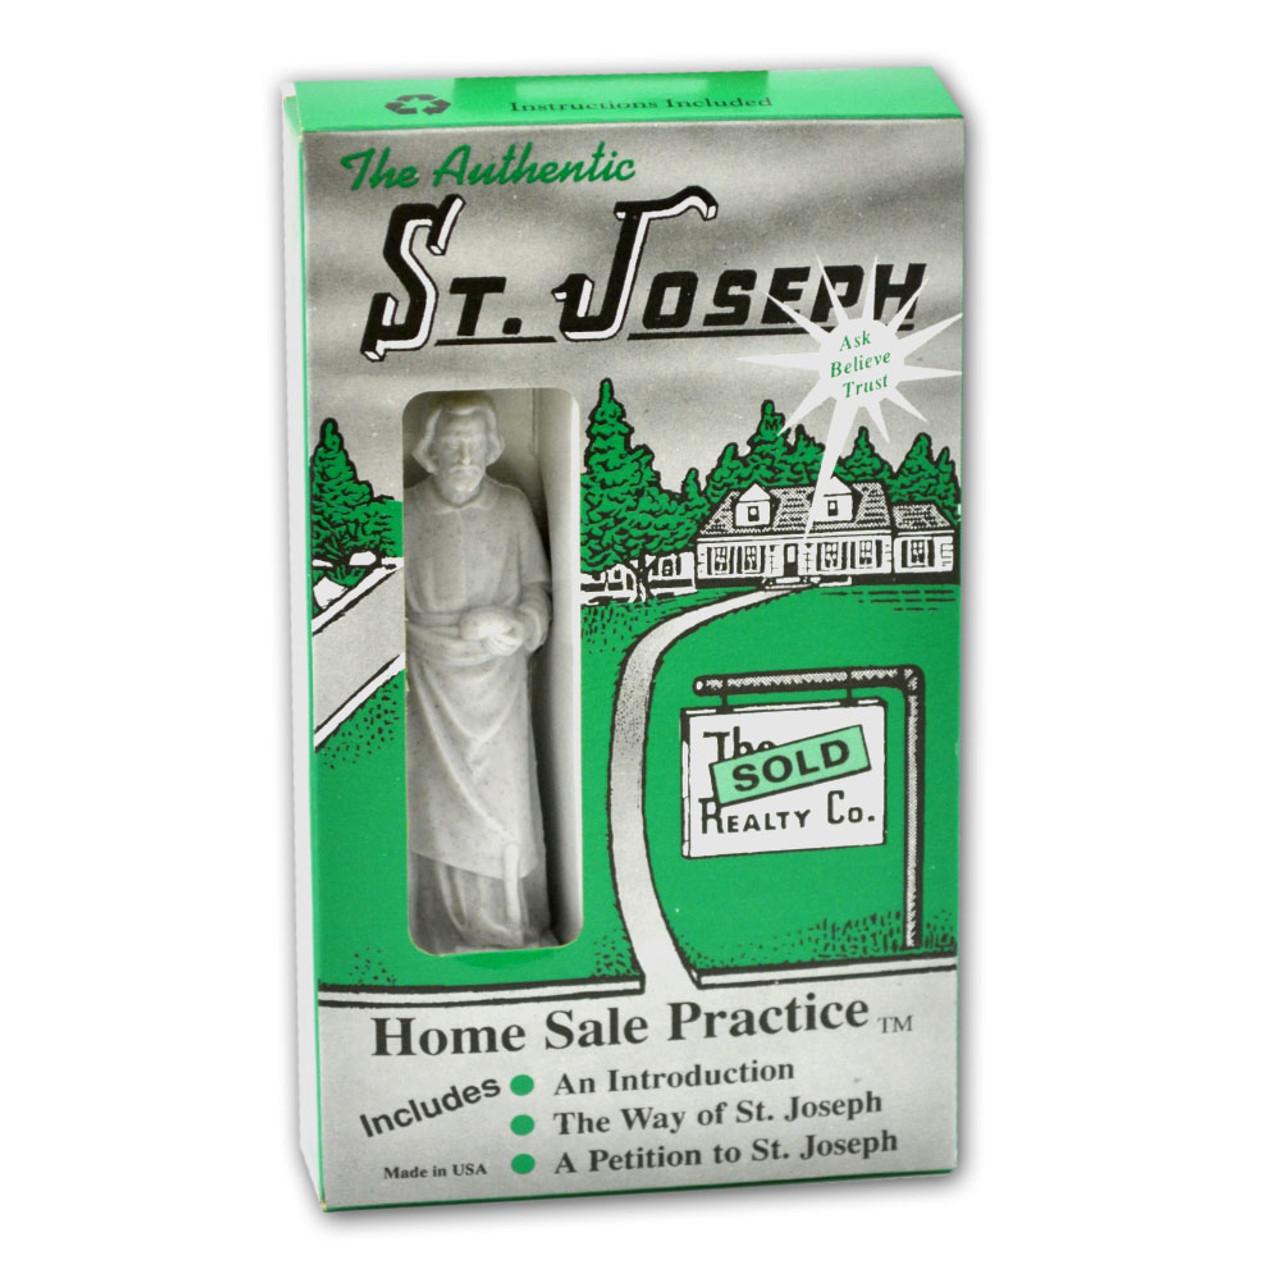 St. Joseph Home Seller's Kit with Statue